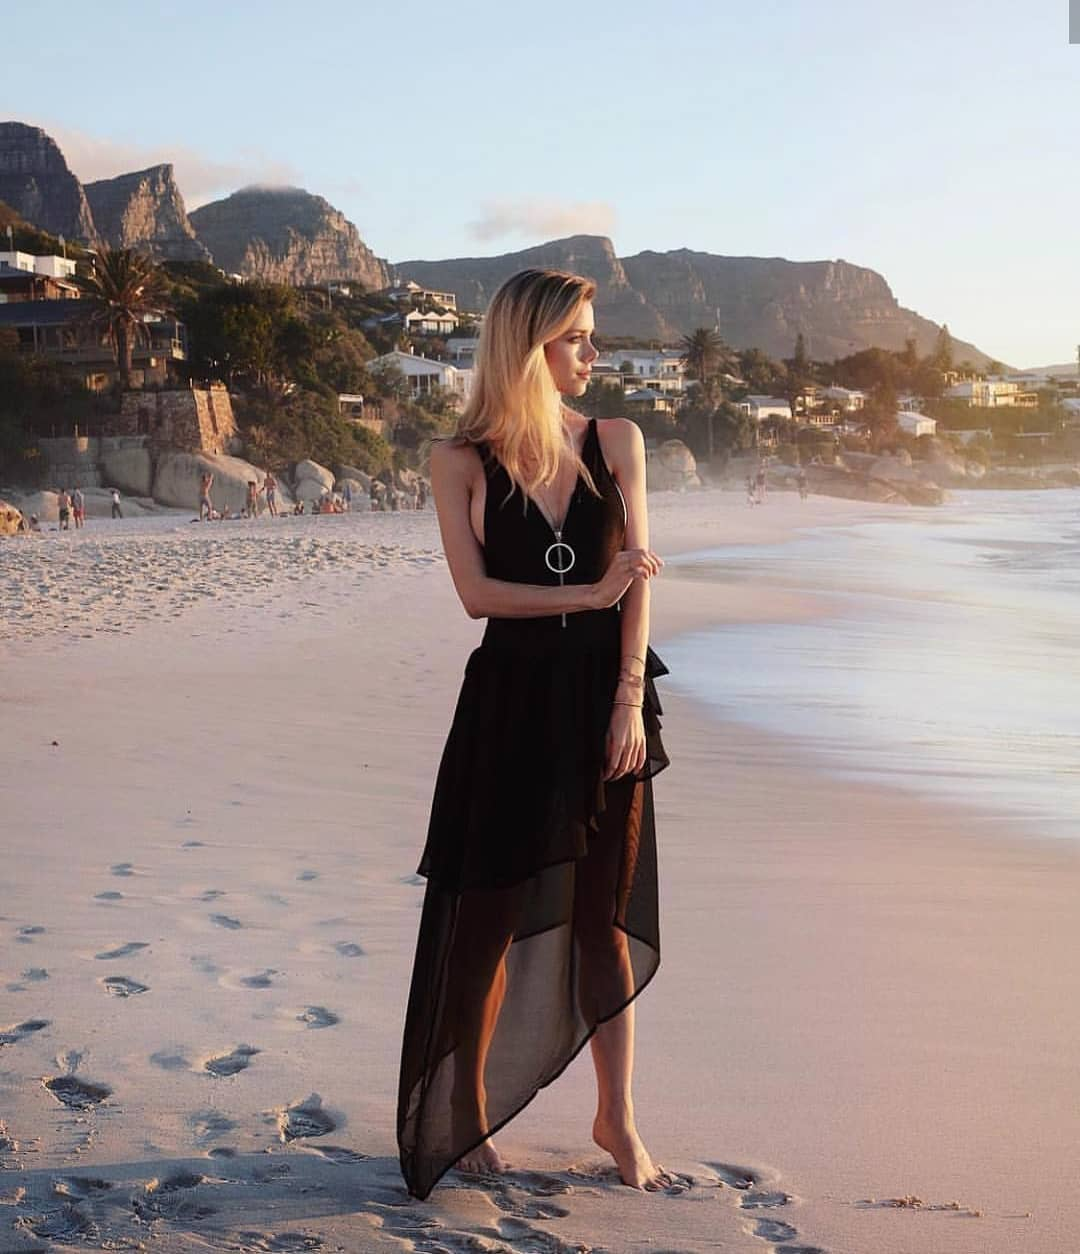 Asymmetric Layered Black Dress For Summer Getaways 2019